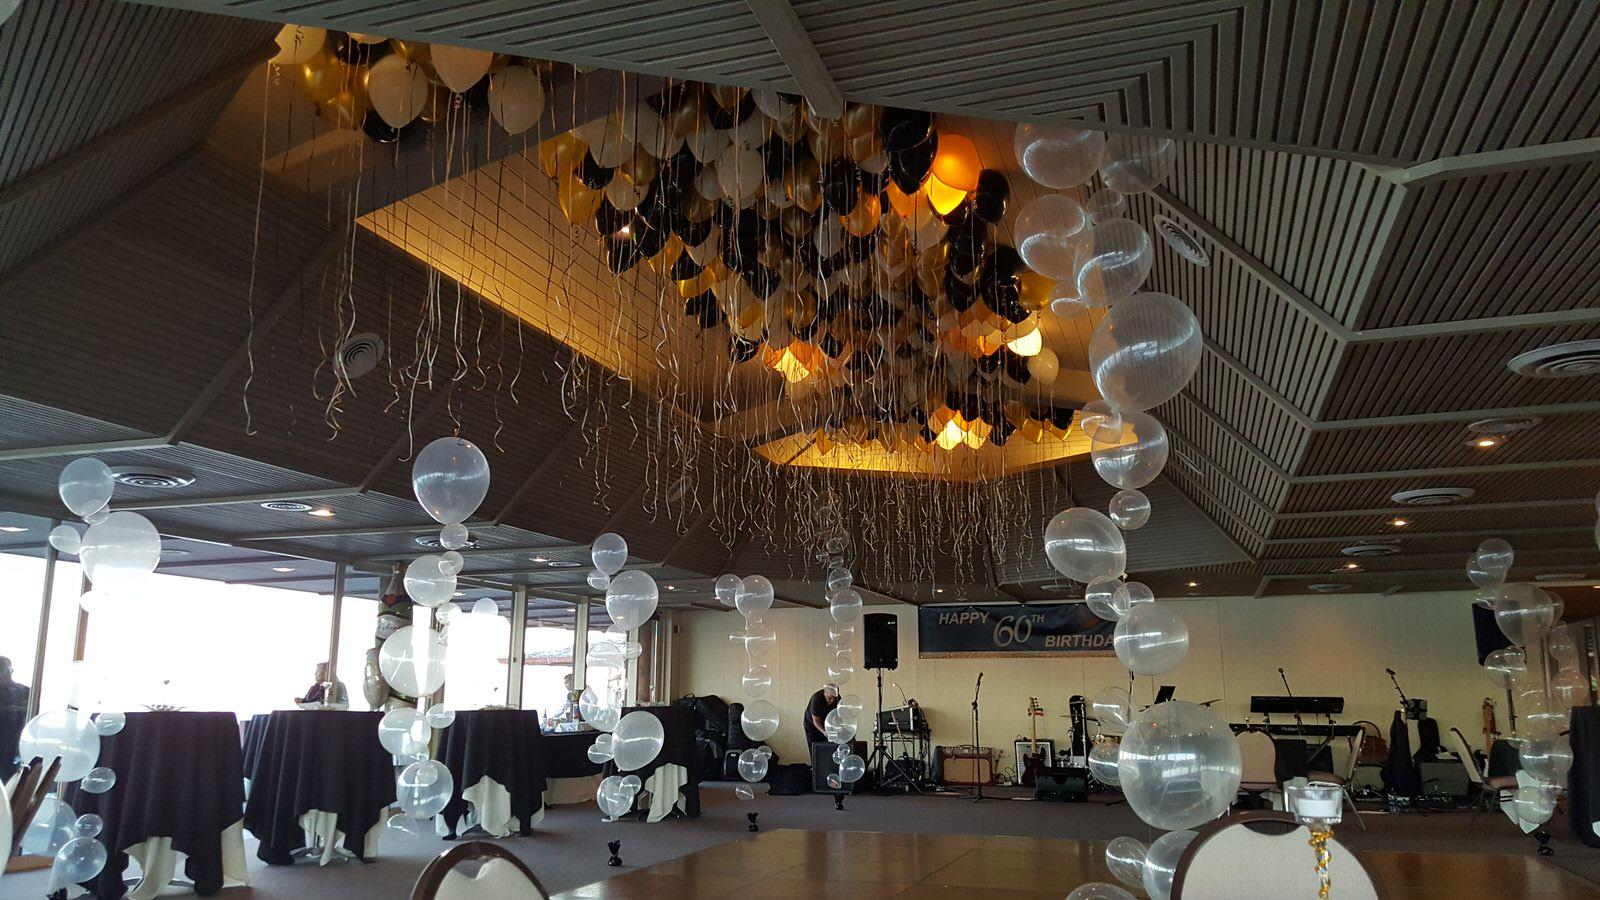 bubble balloon party spinnaker restuarant.jpg